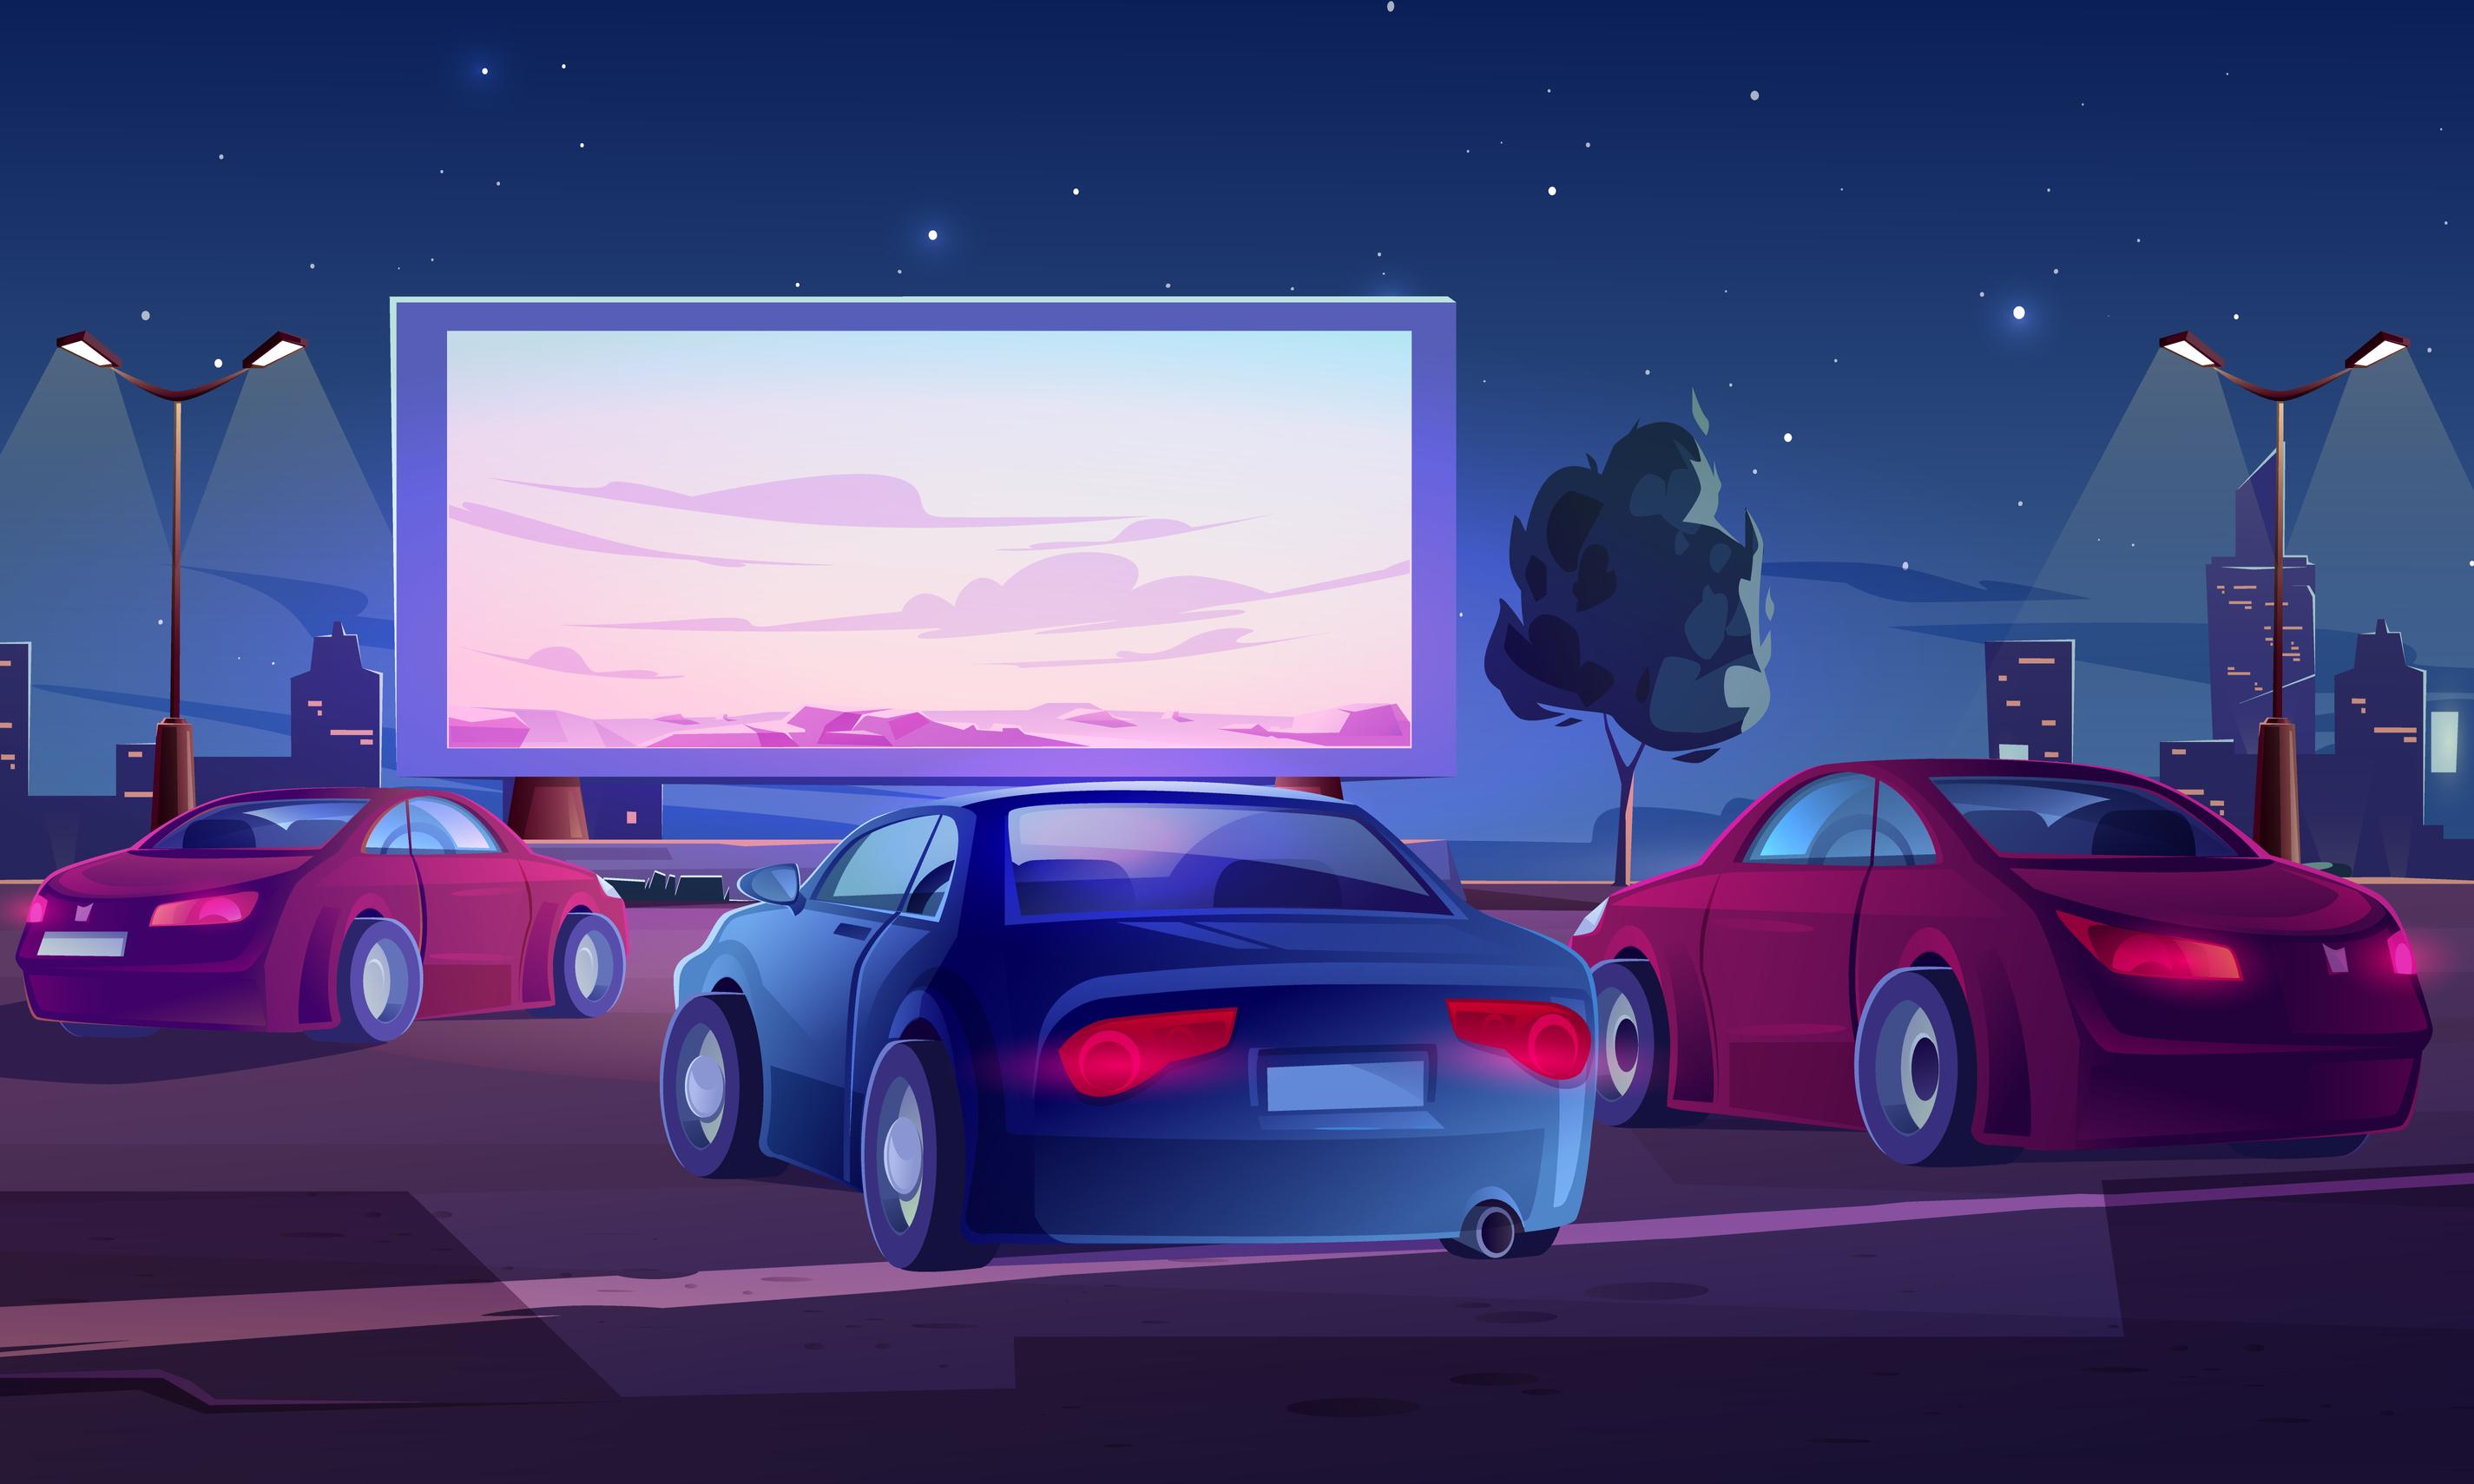 Drive in movie vector illustration